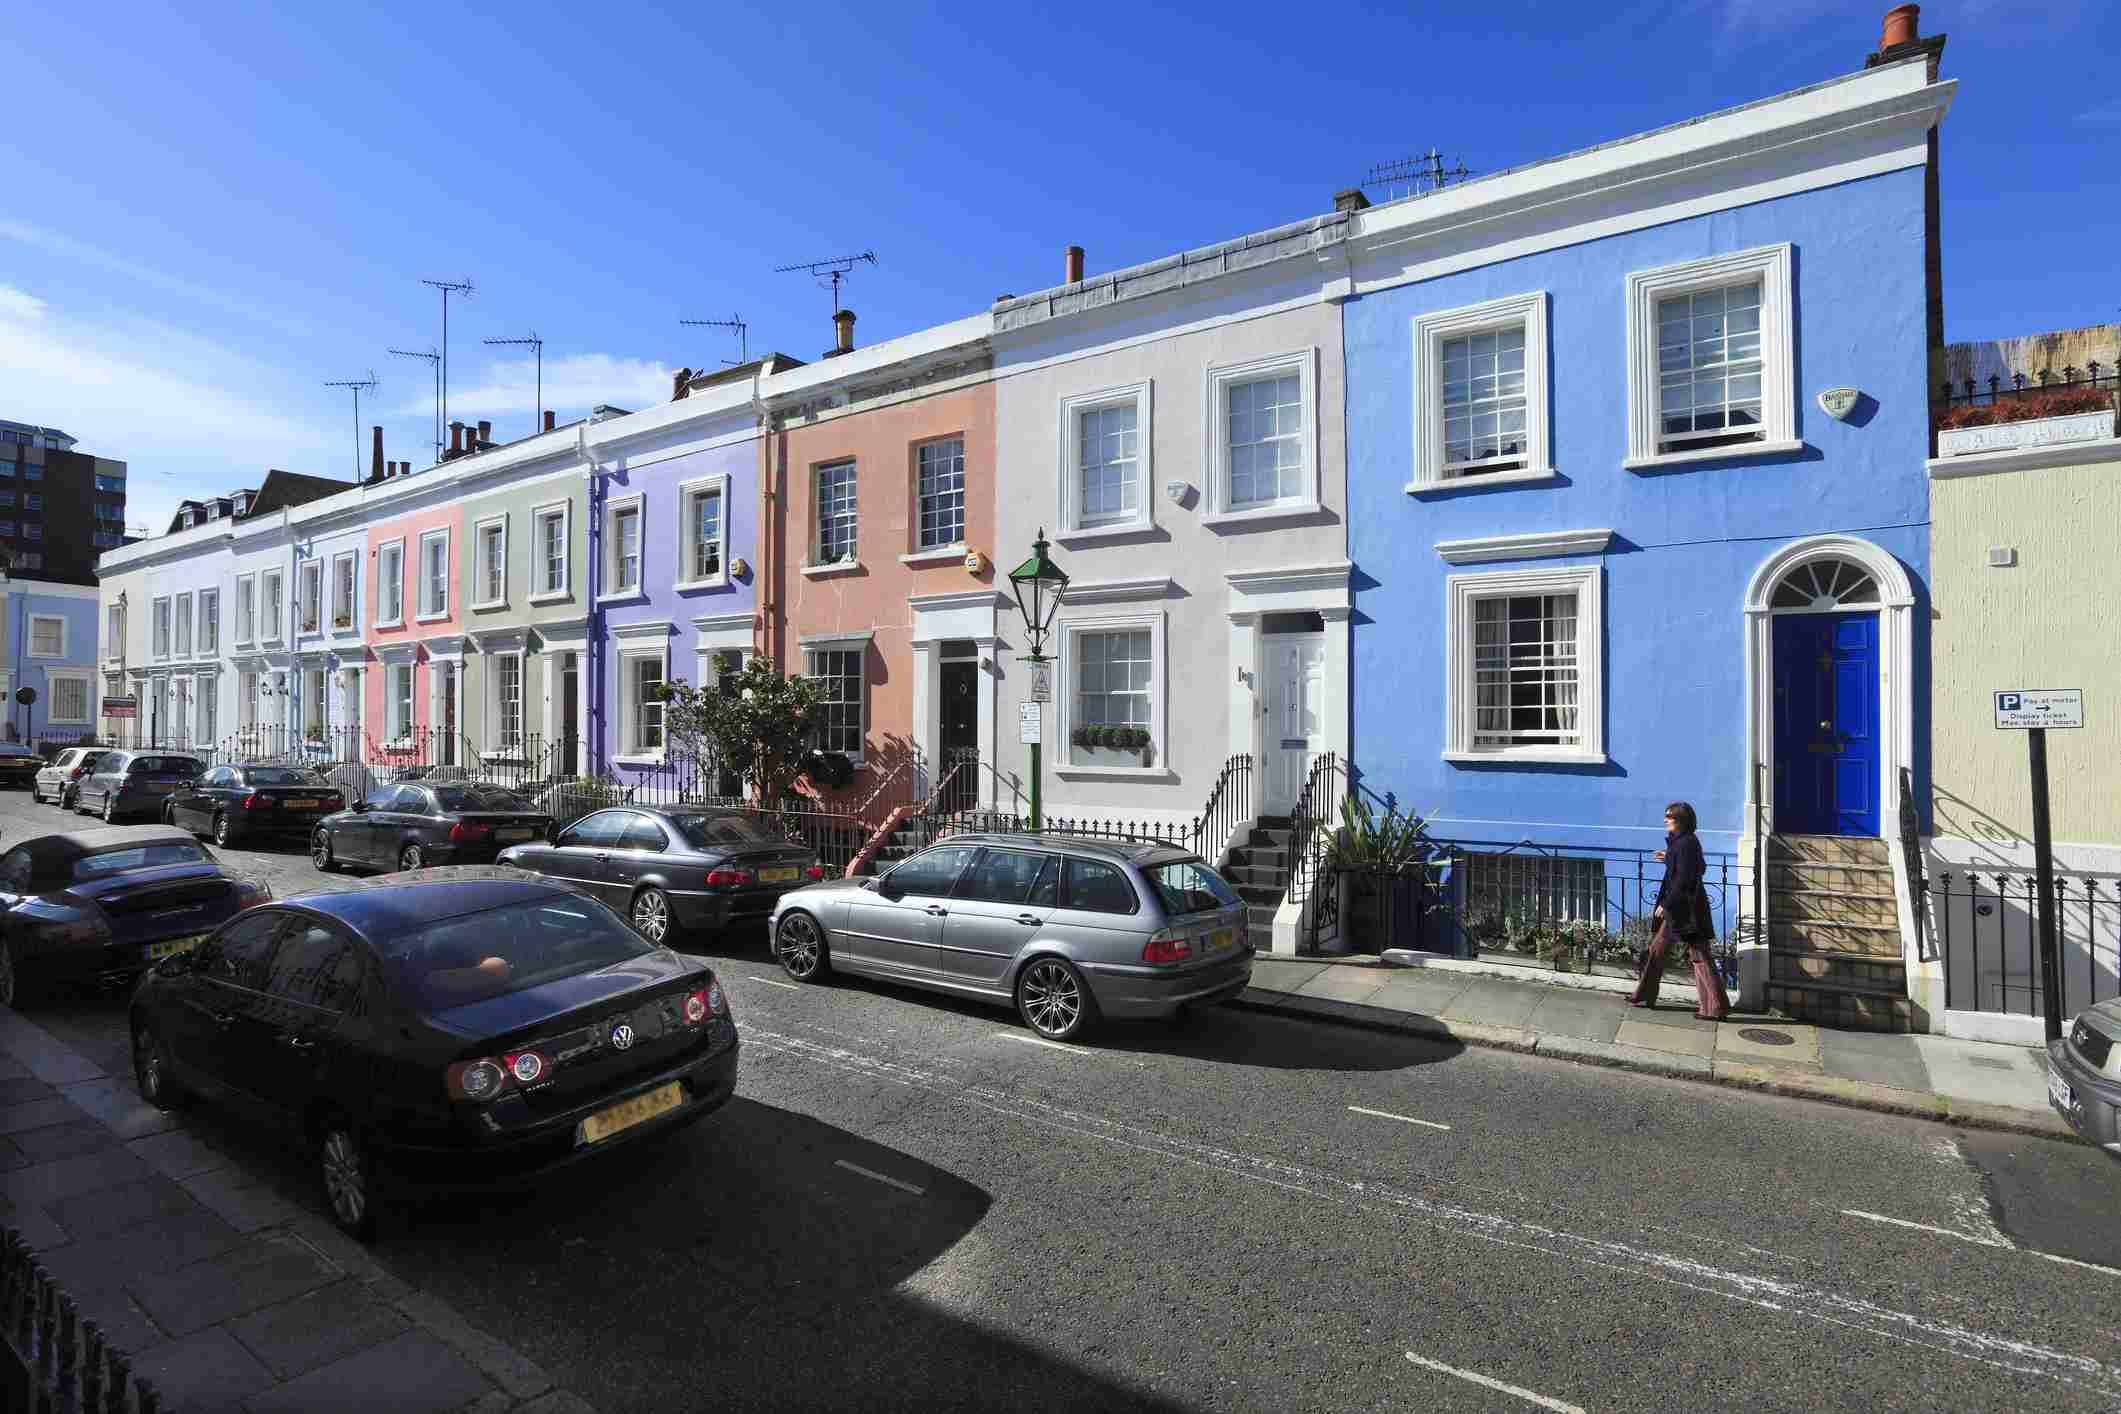 Hillgate Village Notting Hill